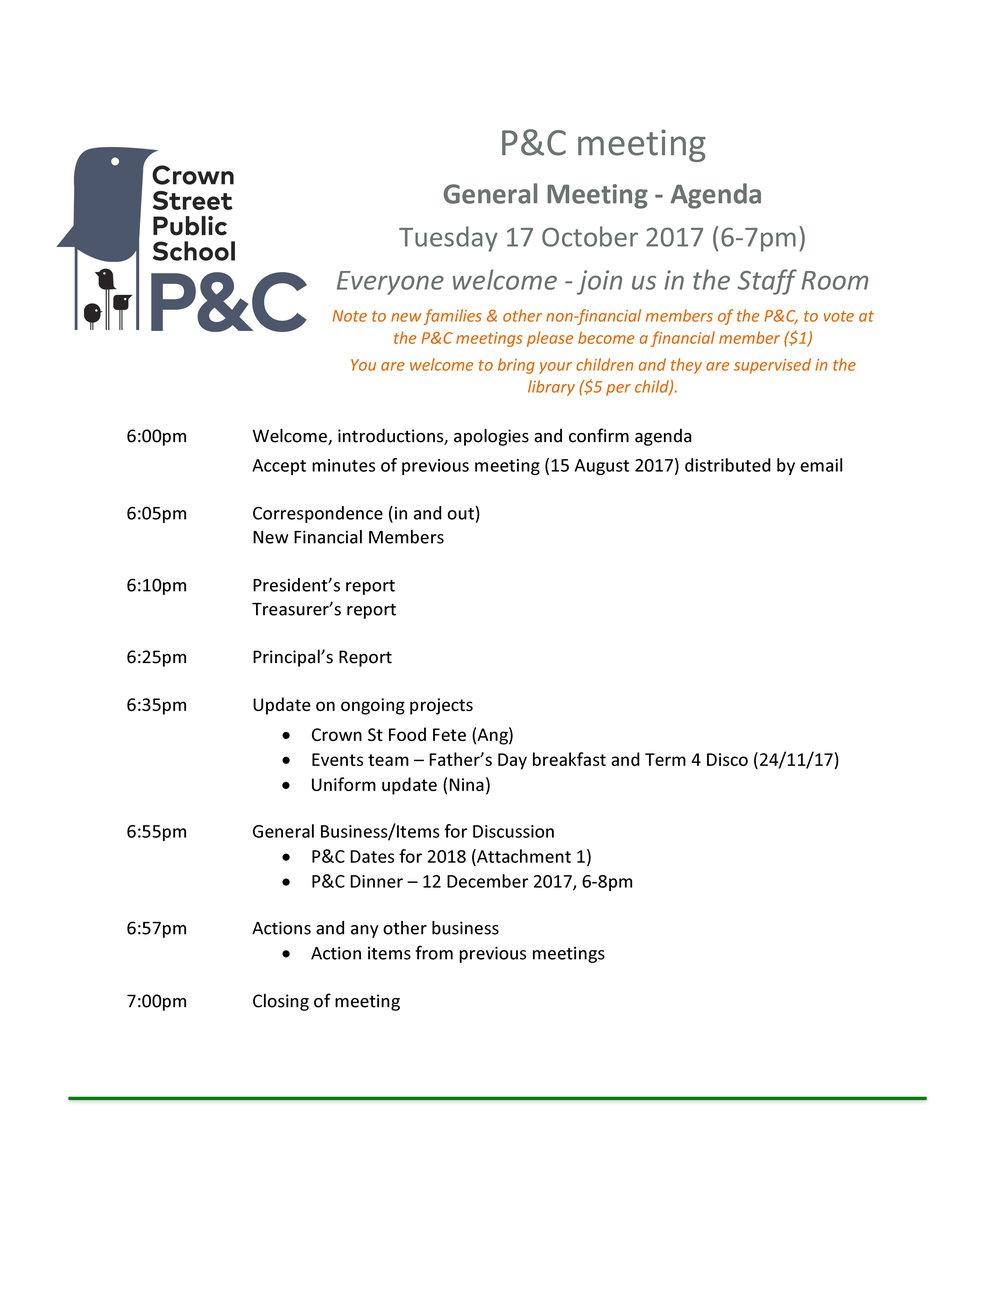 Agenda-Meeting-CSPS_PaC-17-October-2017_Page_1.jpg